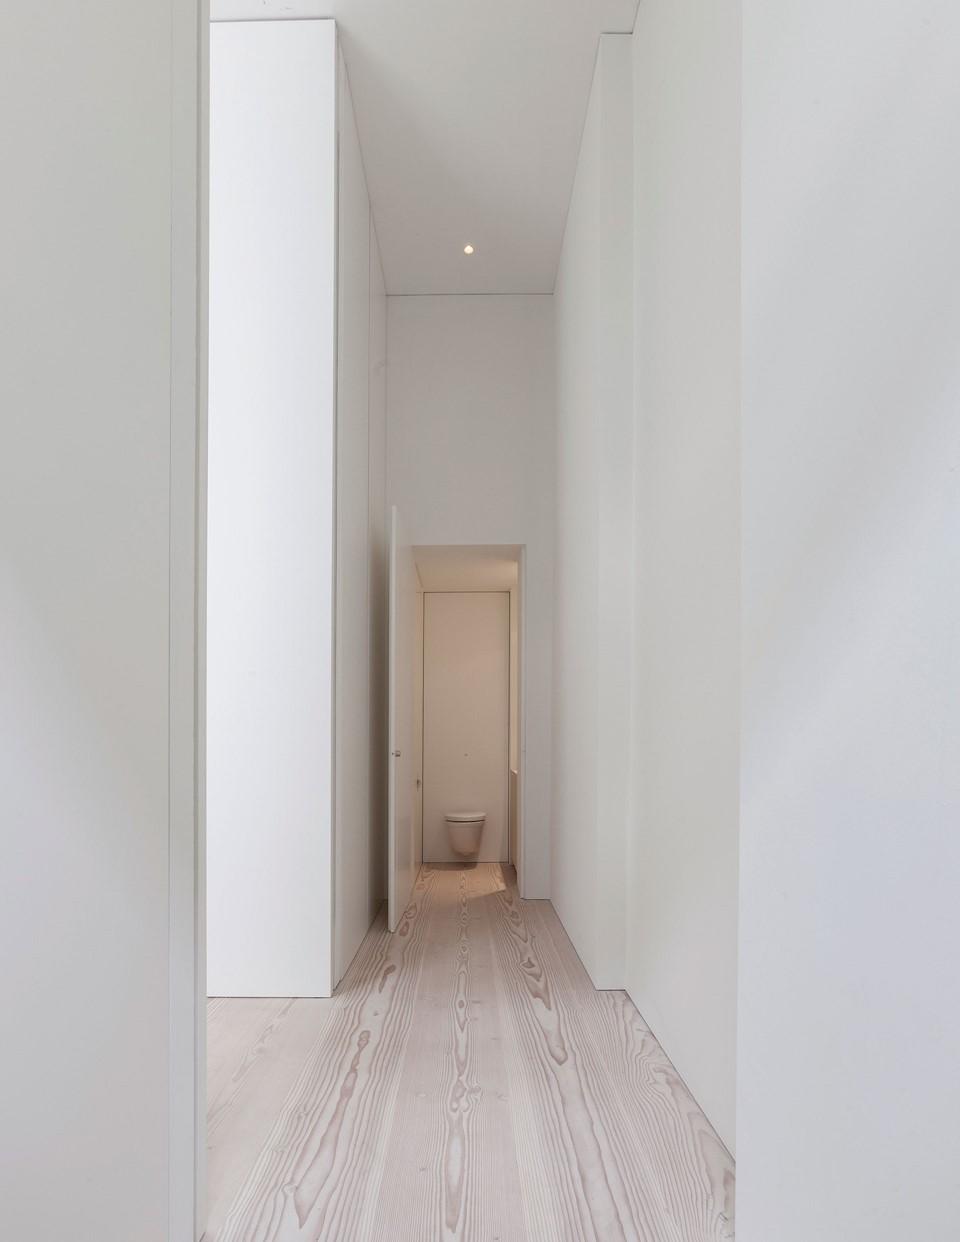 douglas-plank-floor_lye-and-natural-oil_coach-house-amsterdam_hallway_dinesen.jpg